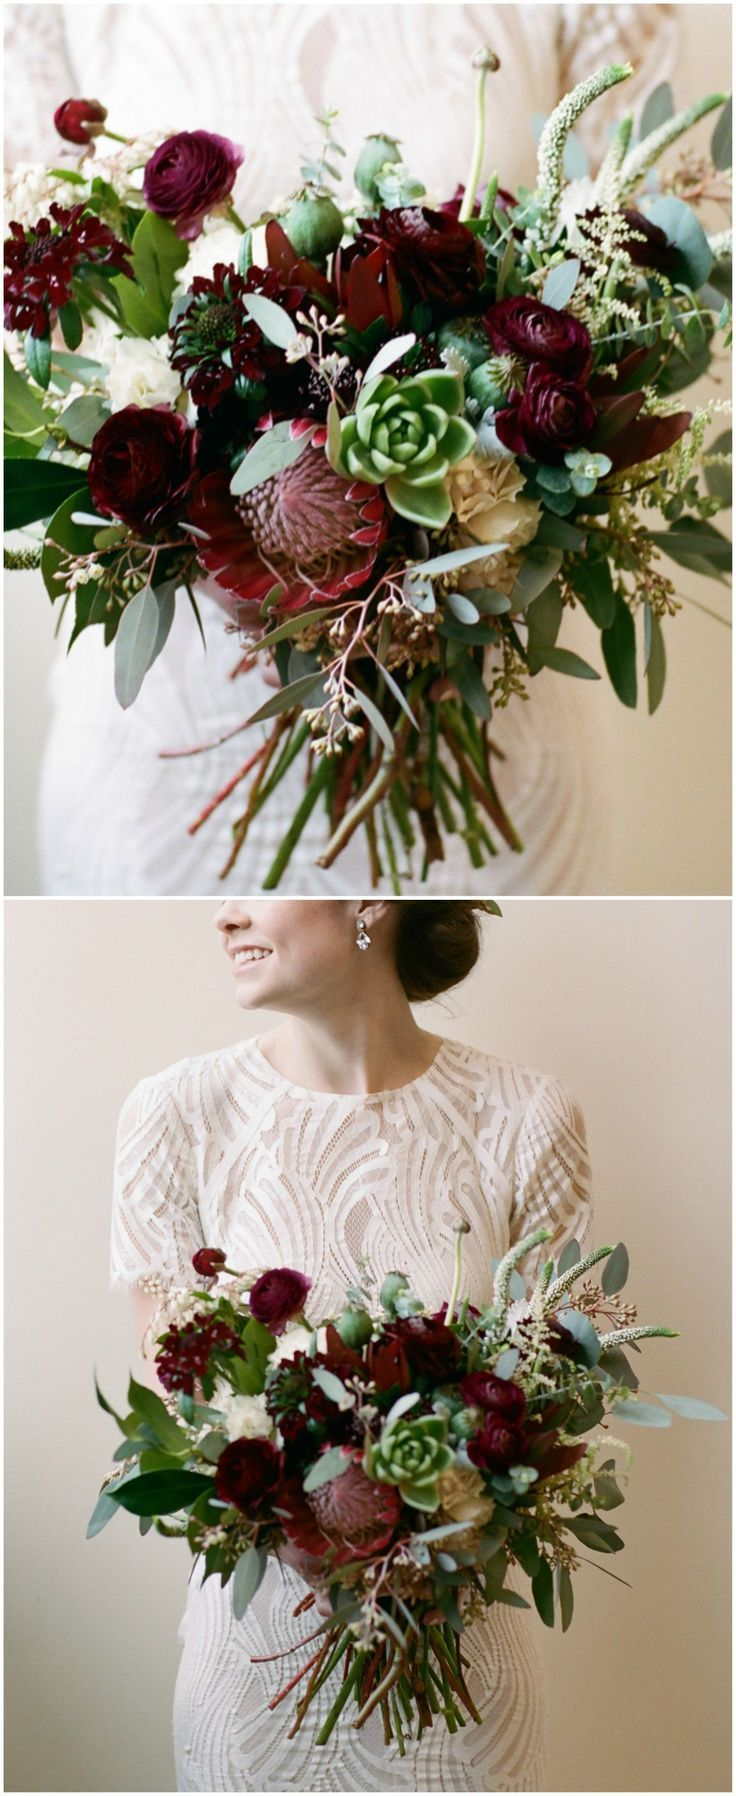 Wedding bouquets, fall wedding colors, fall bouquet colors, vintage flower bouquets, lush bridal bouquet, get more inspiration on borrowedandblue.com // White Rabbit Studios